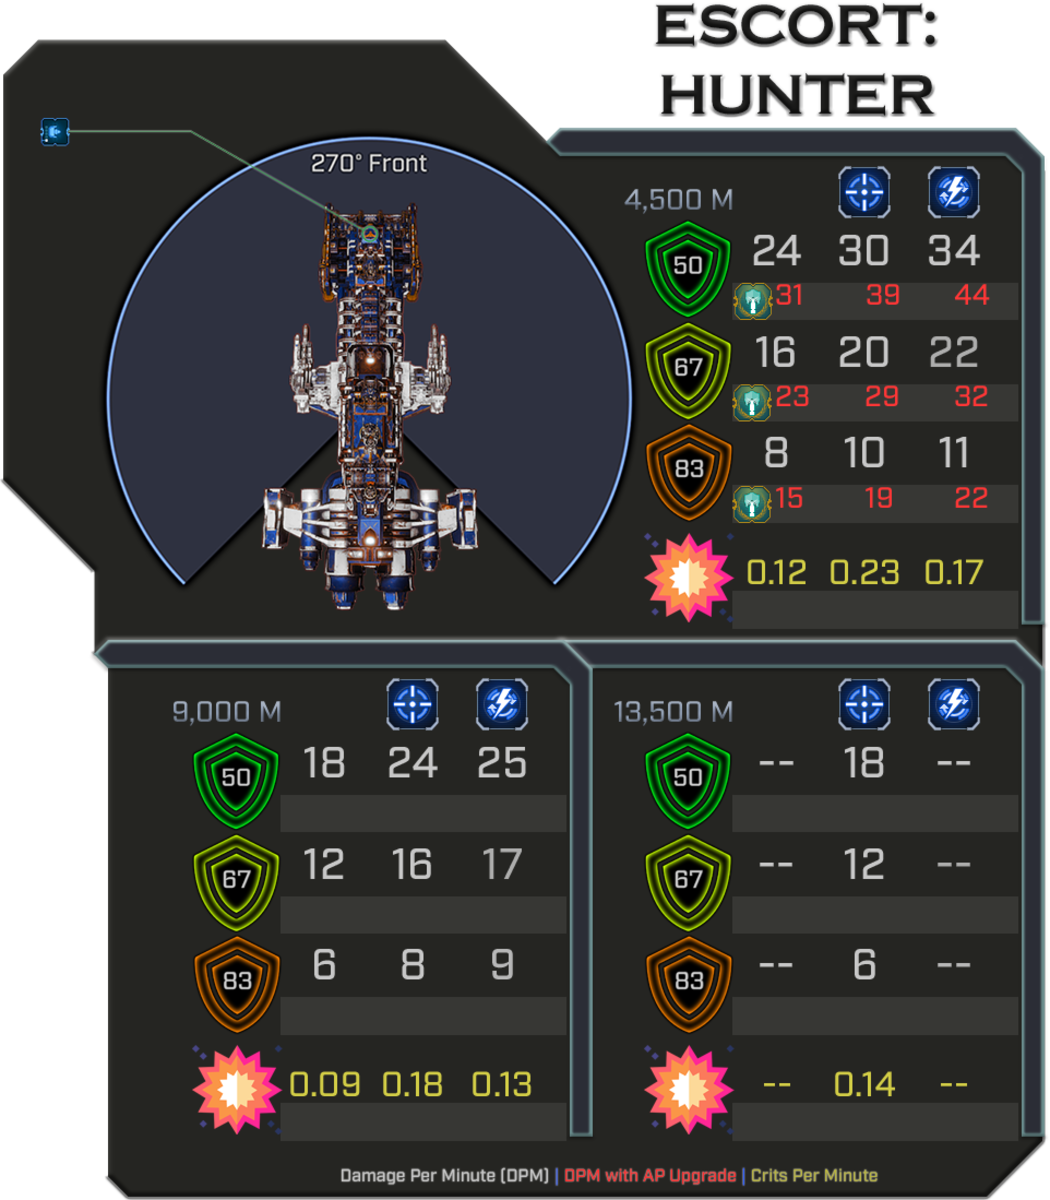 Hunter - Weapon Damage Profile